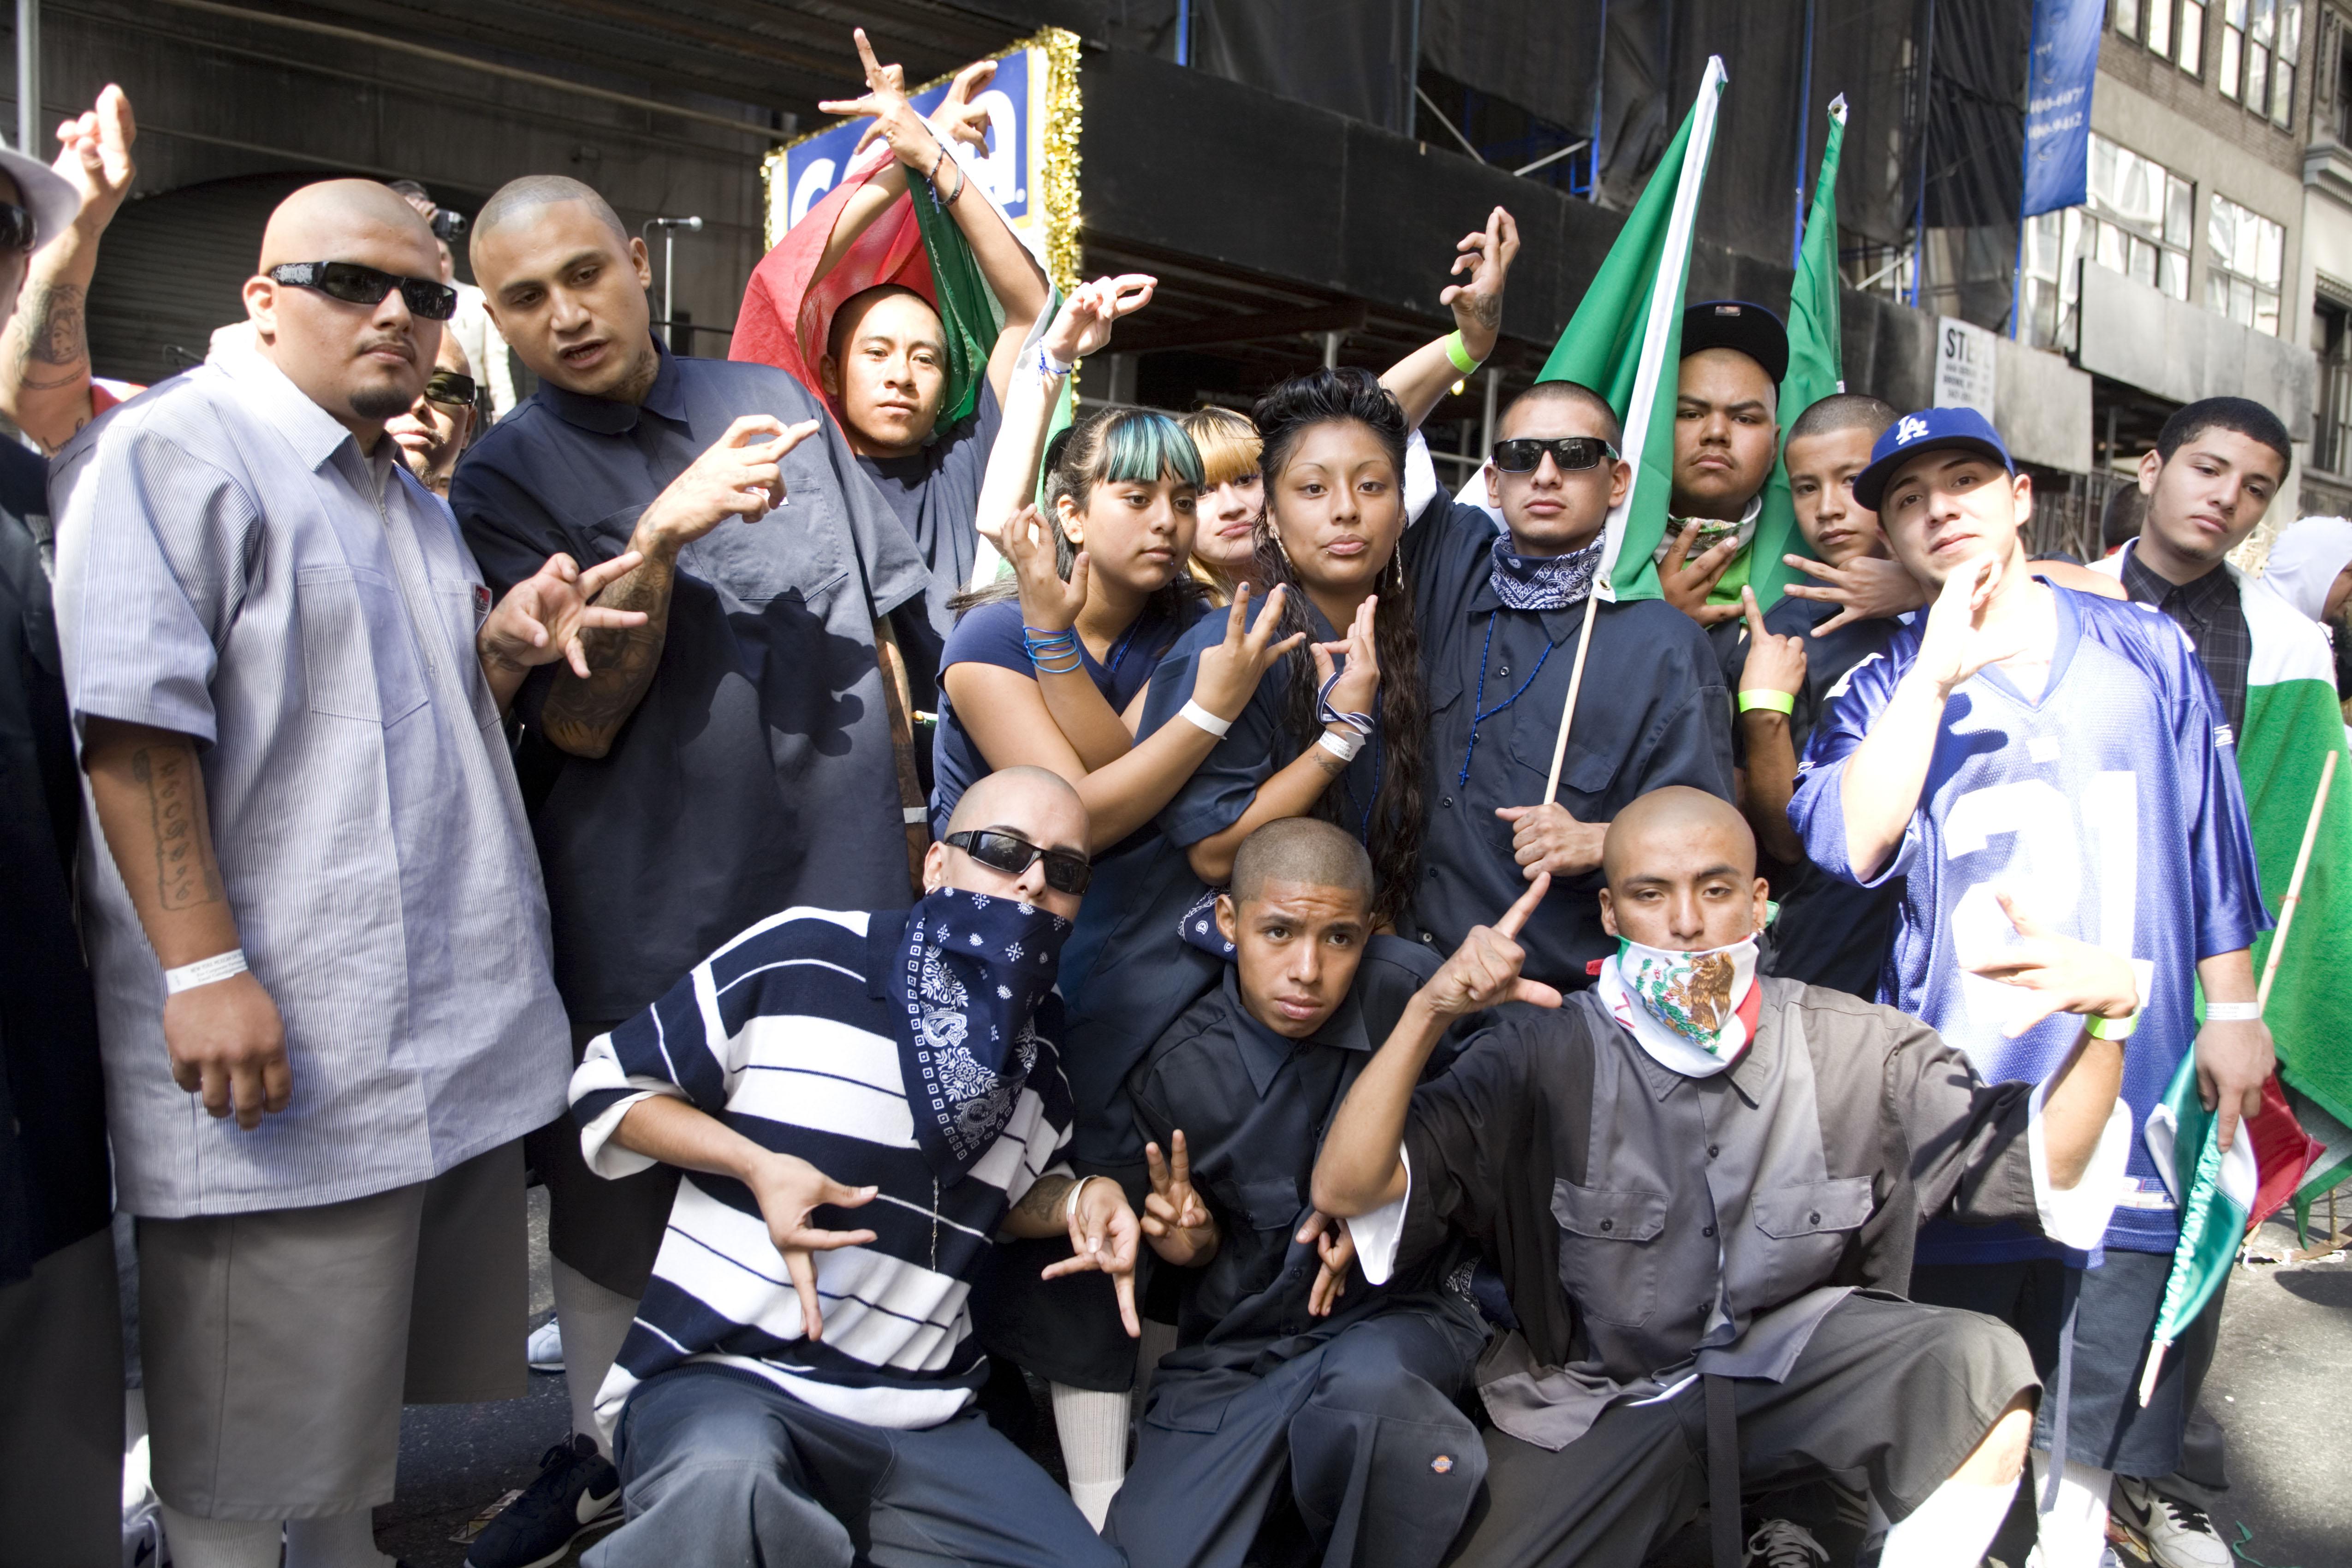 Overcoming-Gang-Culture-in-Honduras -GAL1